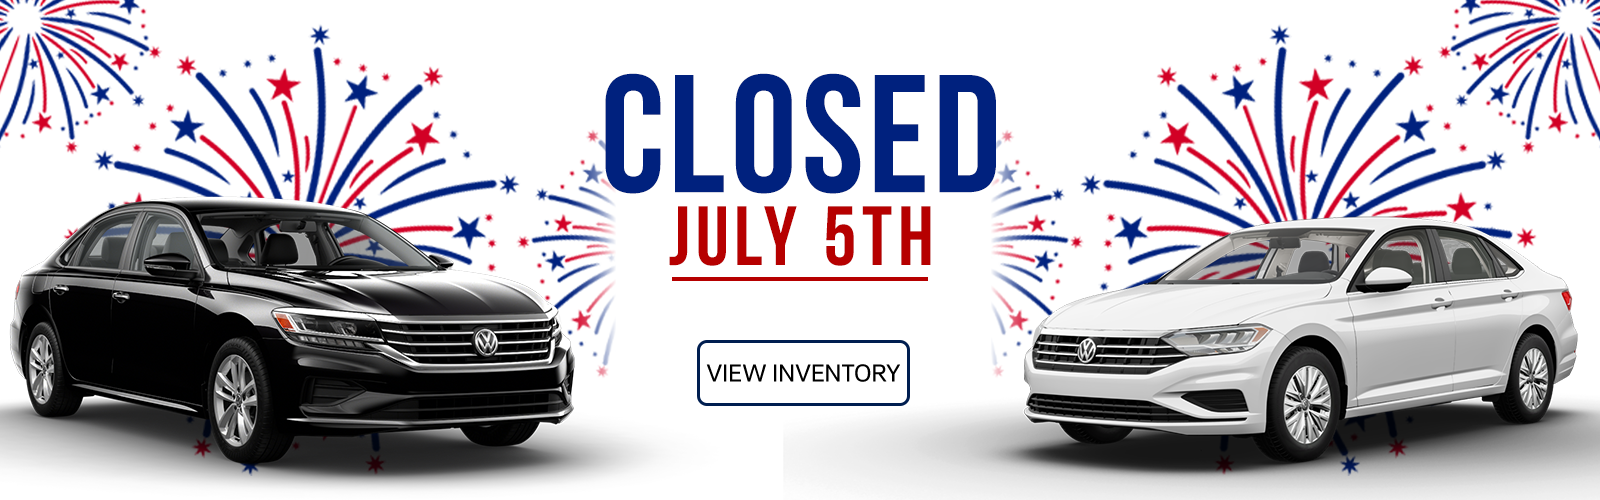 JULY 5TH CLOSED